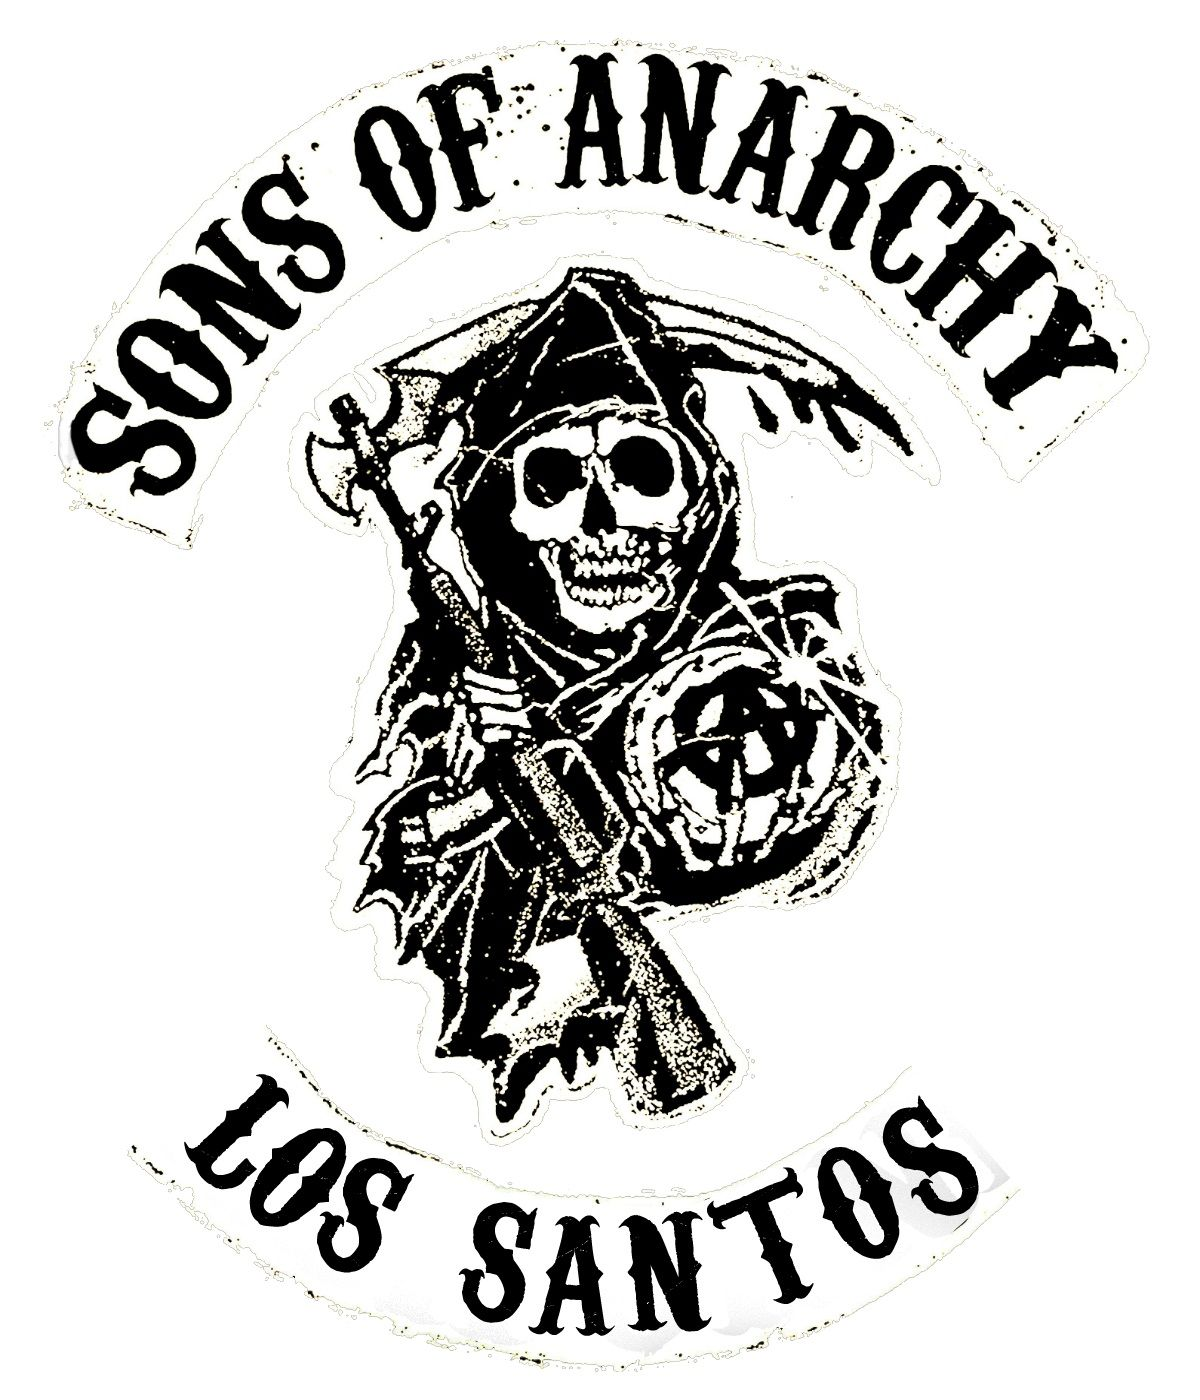 Soa Reaper Logos And States